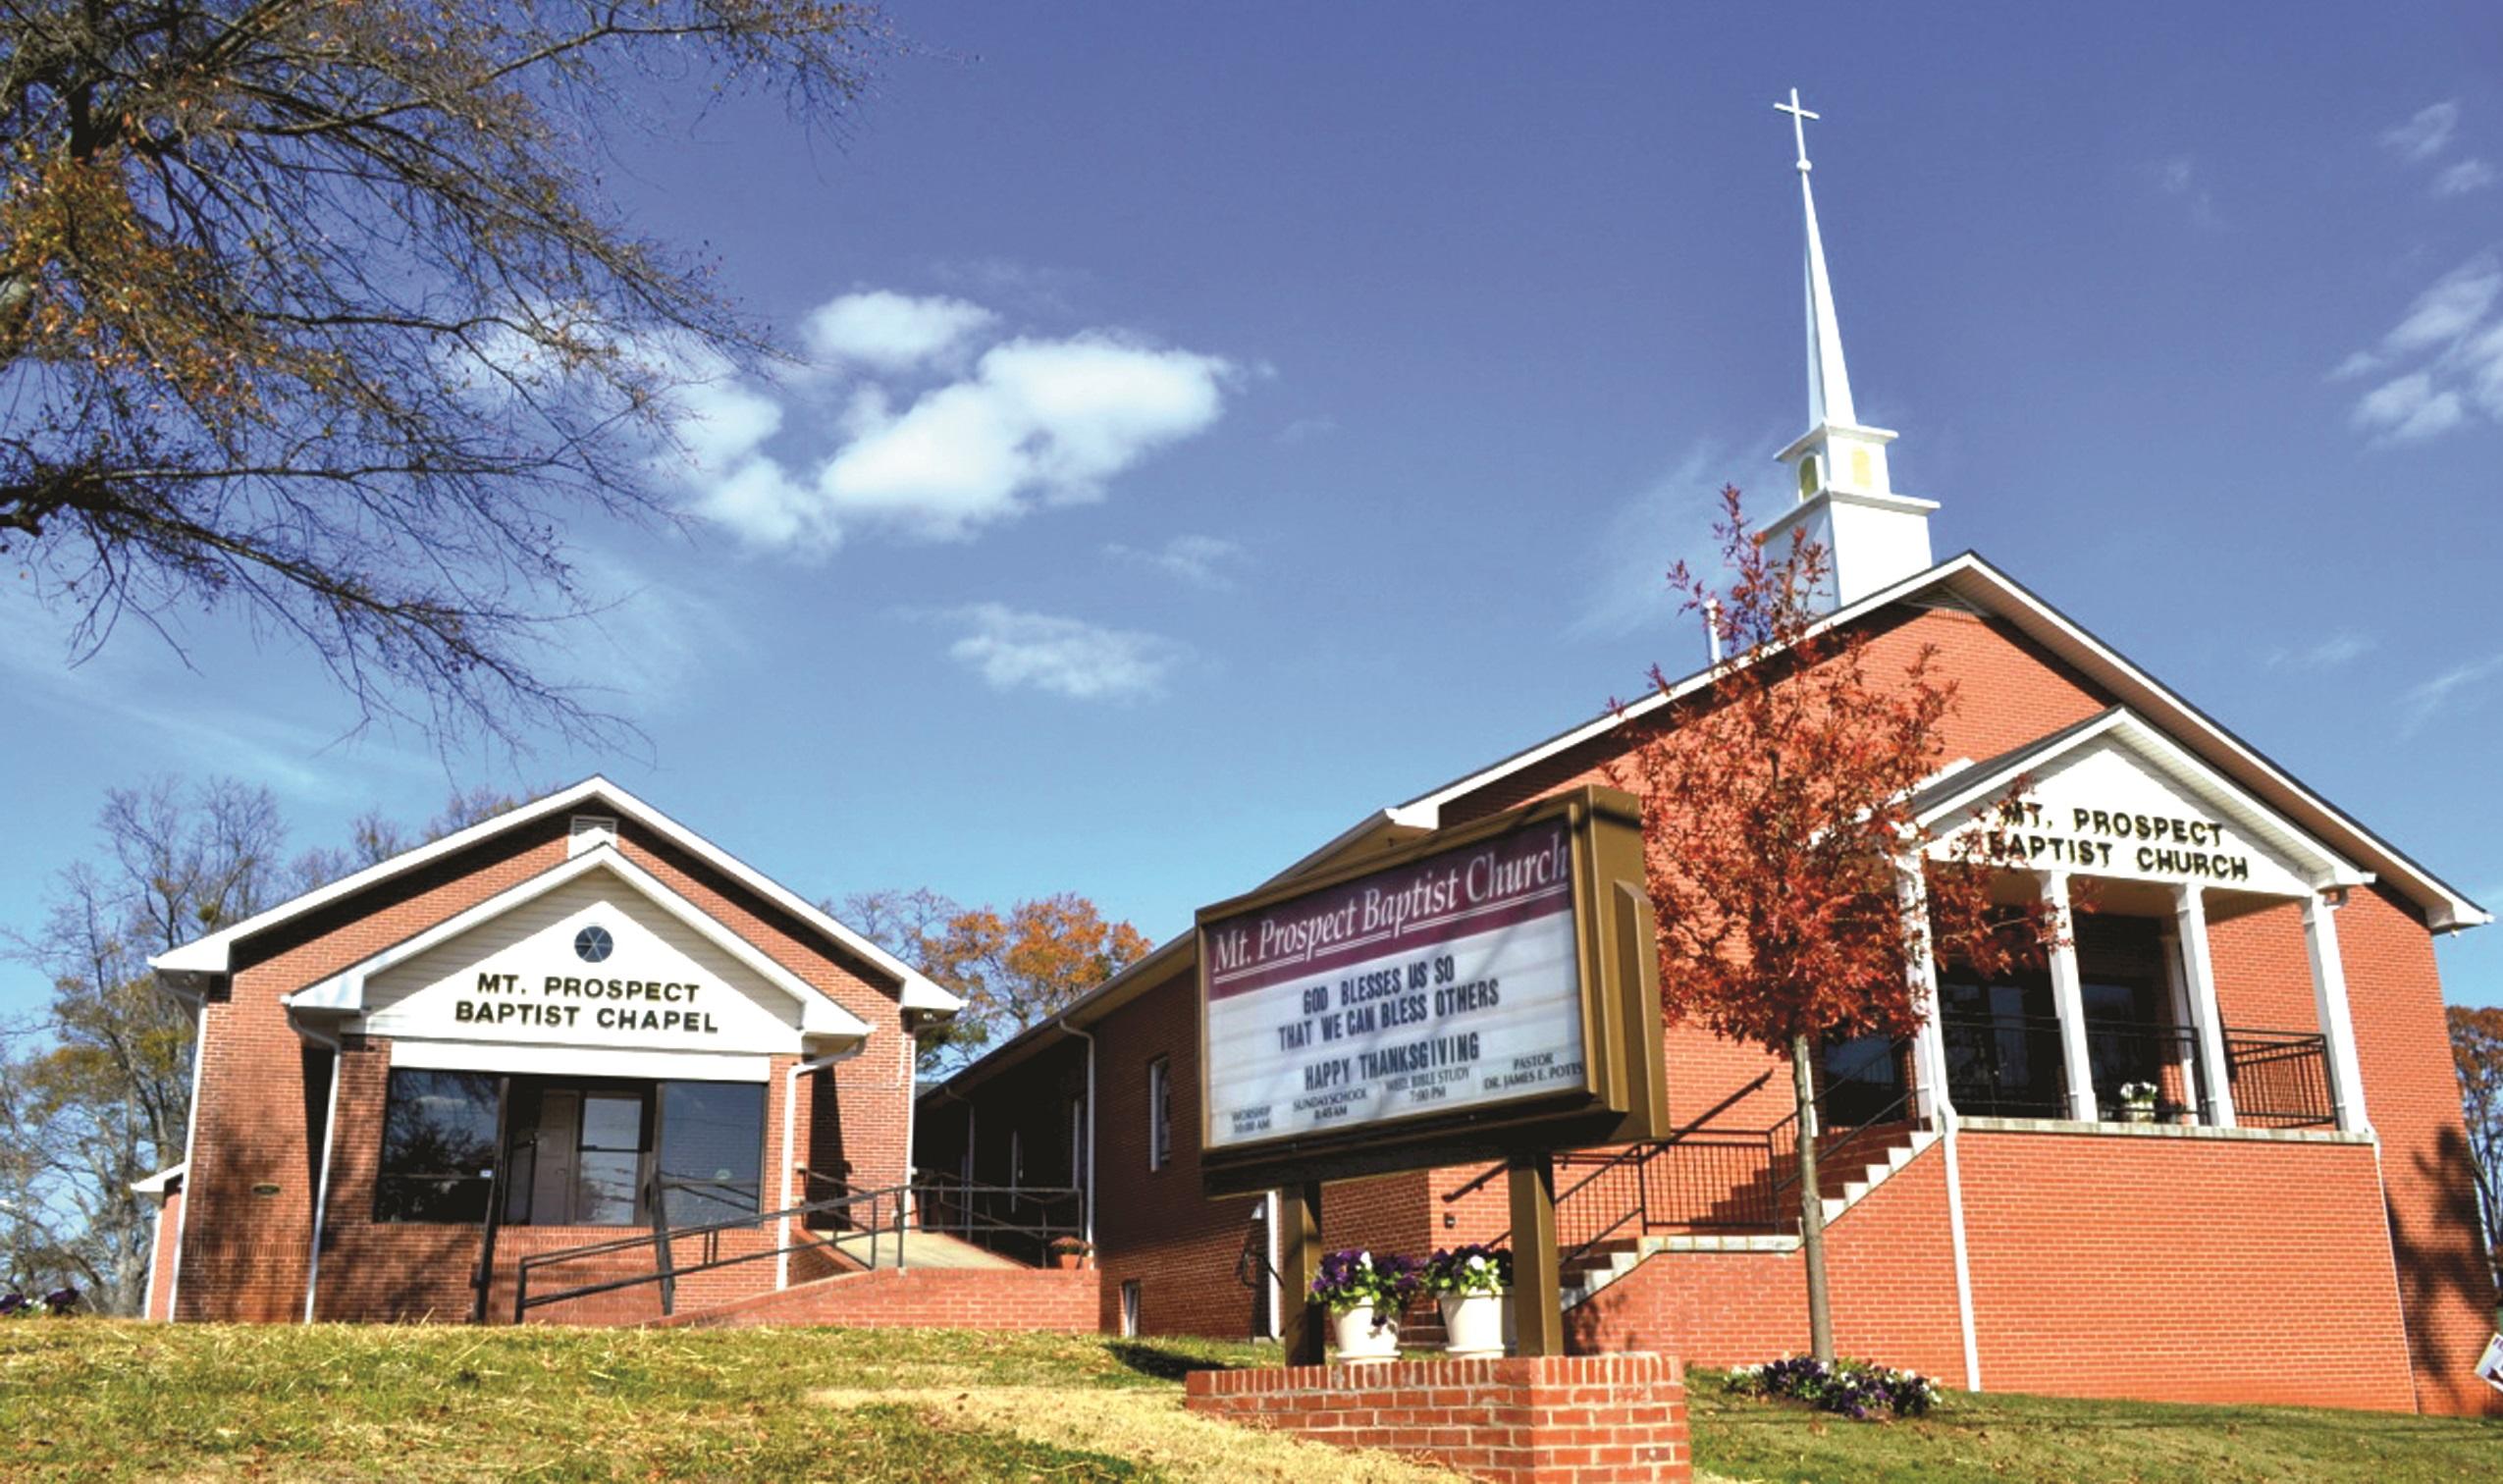 Mt Prospect Baptist Church 133 Thomas Dorsey Dr, Villa Rica